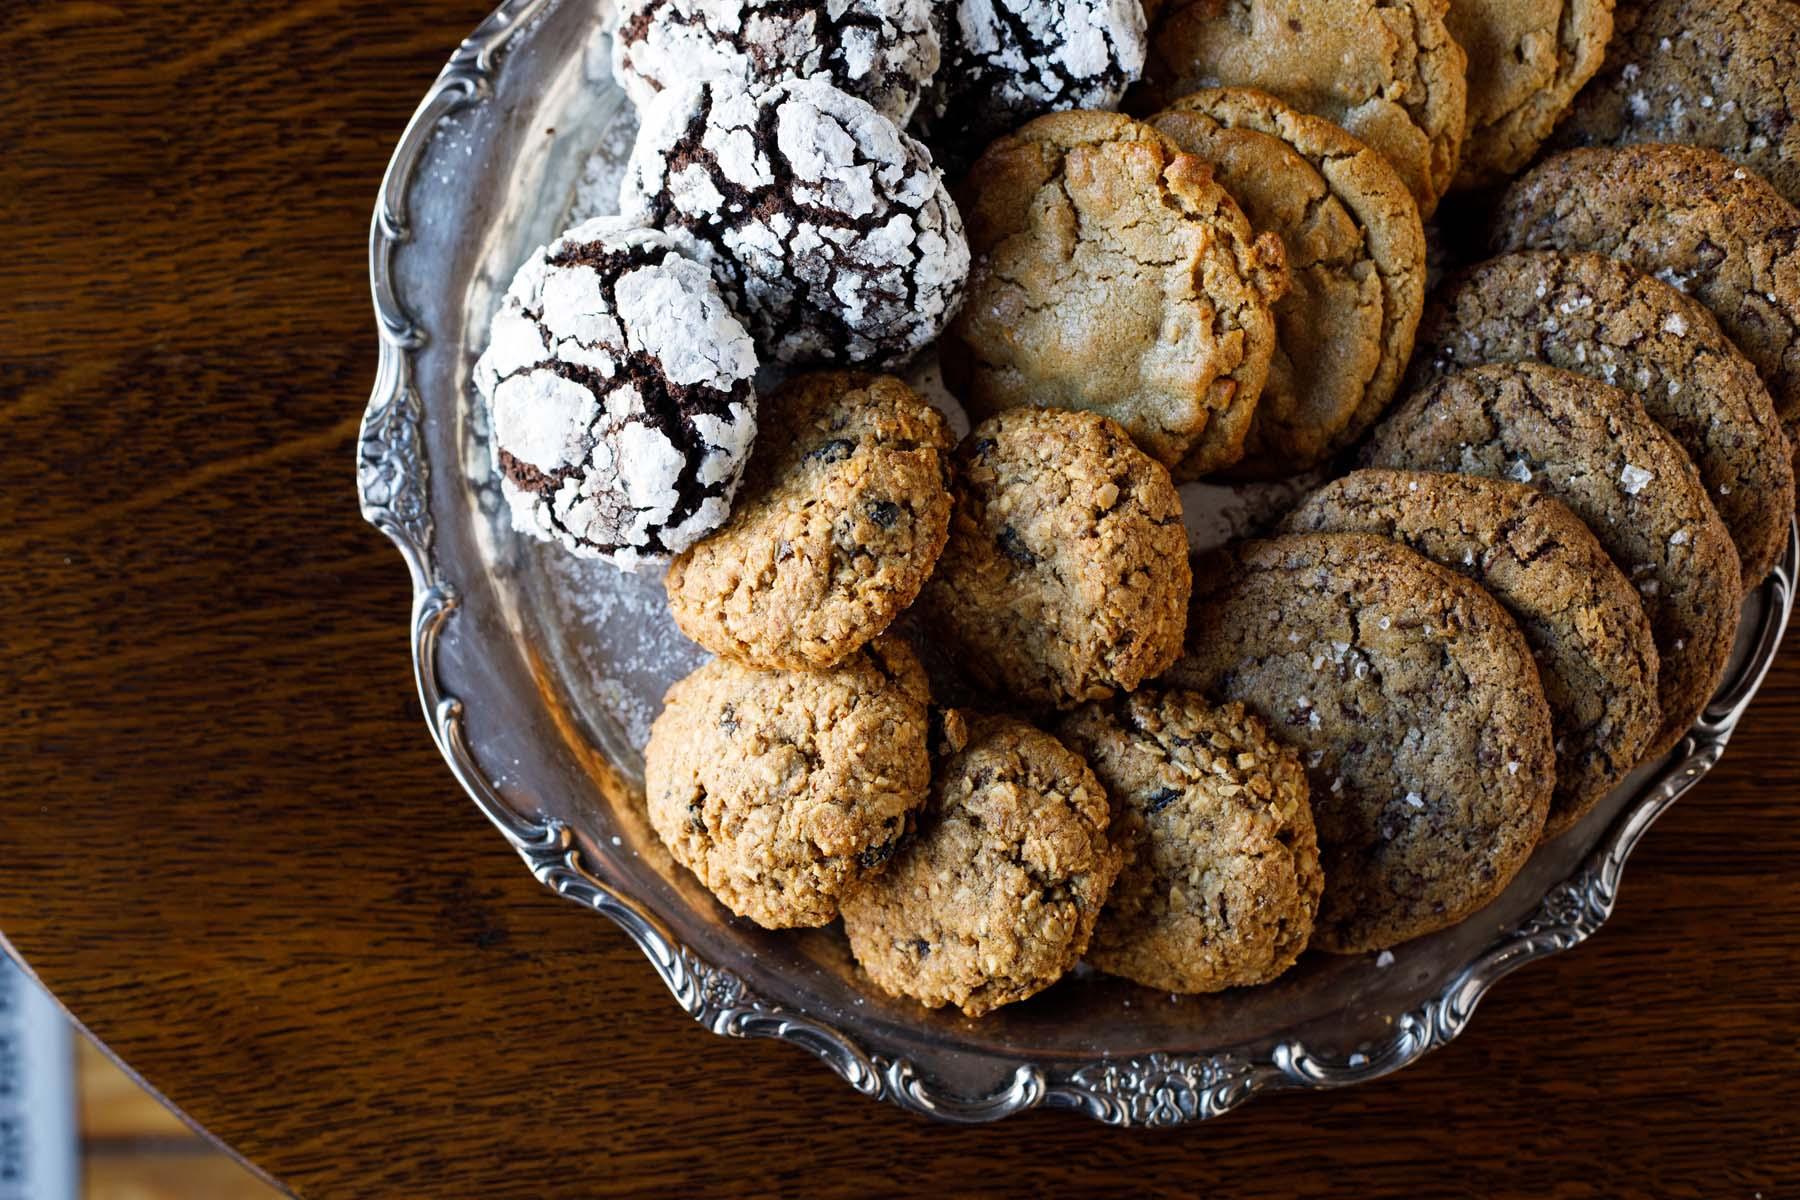 Best desserts in Wichita - Assorted Cookies